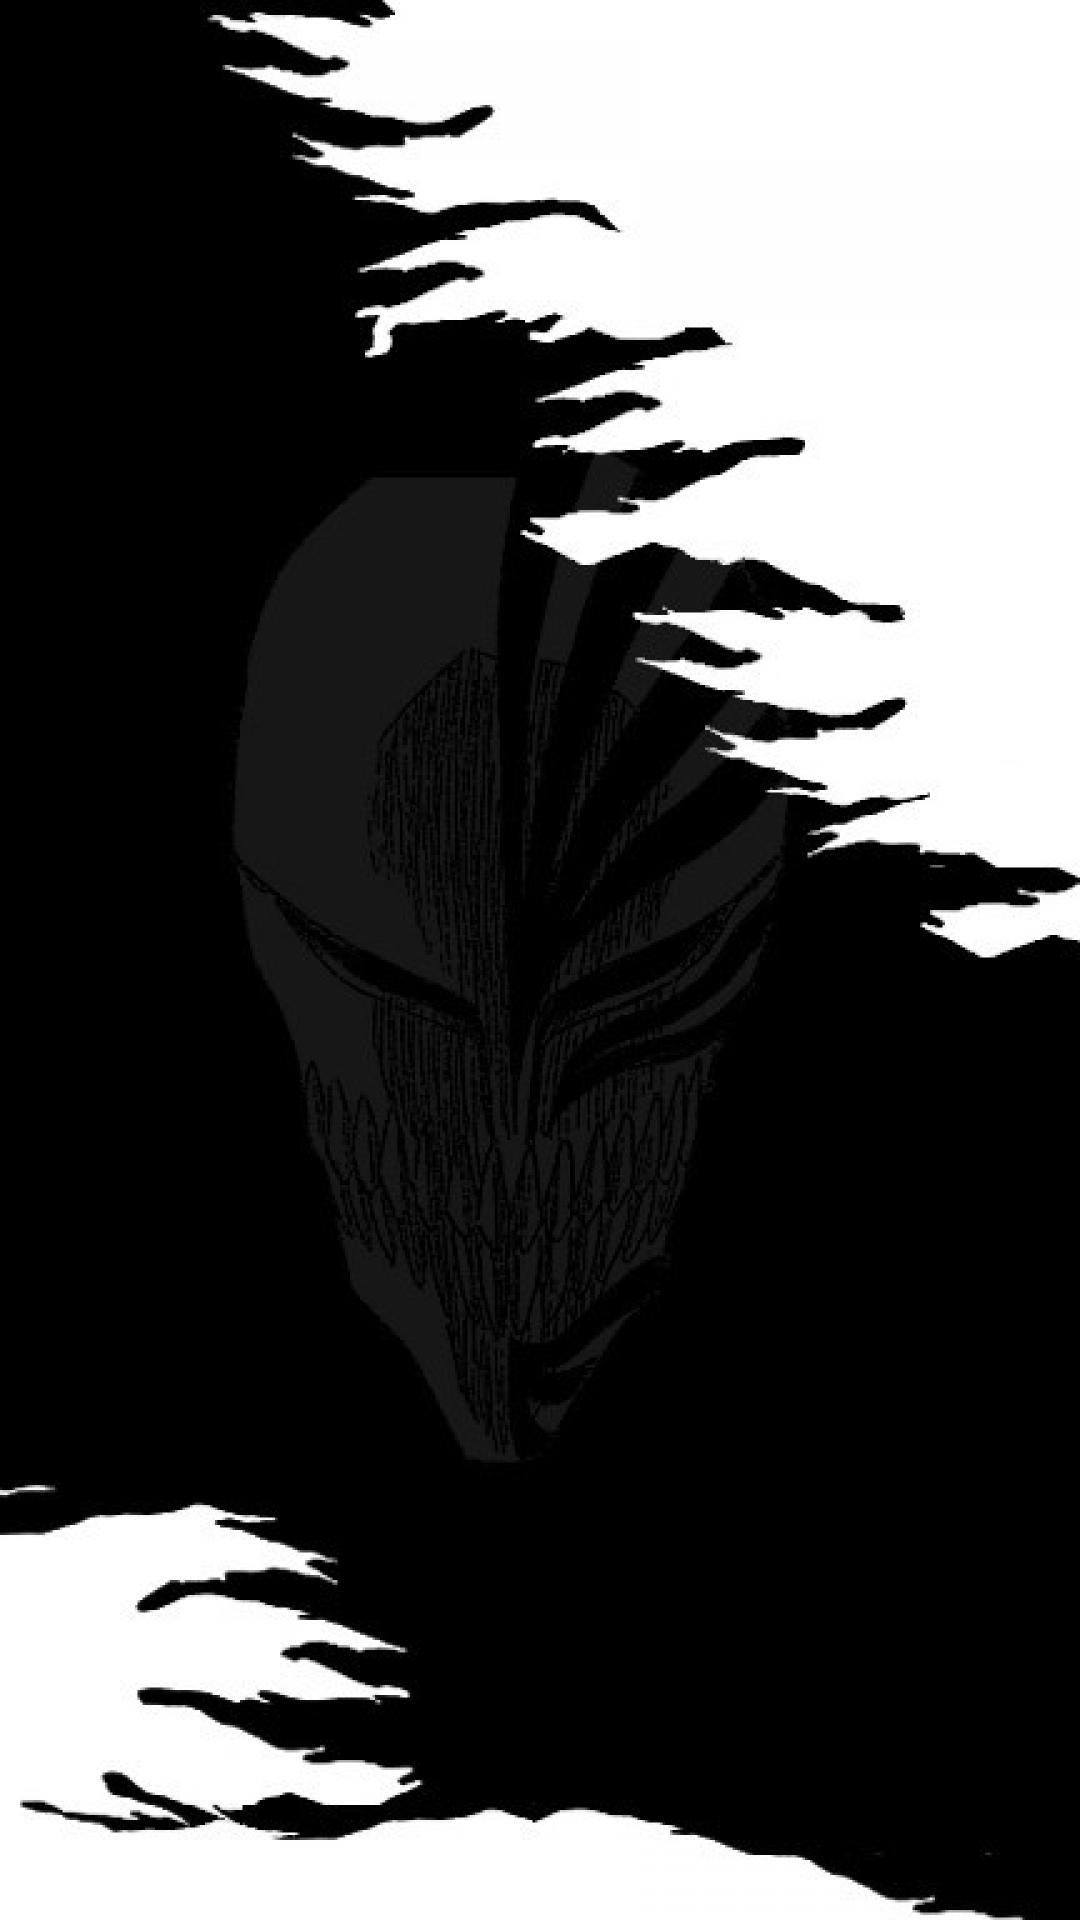 1080x1920 Bleach Kurosaki Ichigo Silhouette Grayscale Manga Hollow Mask